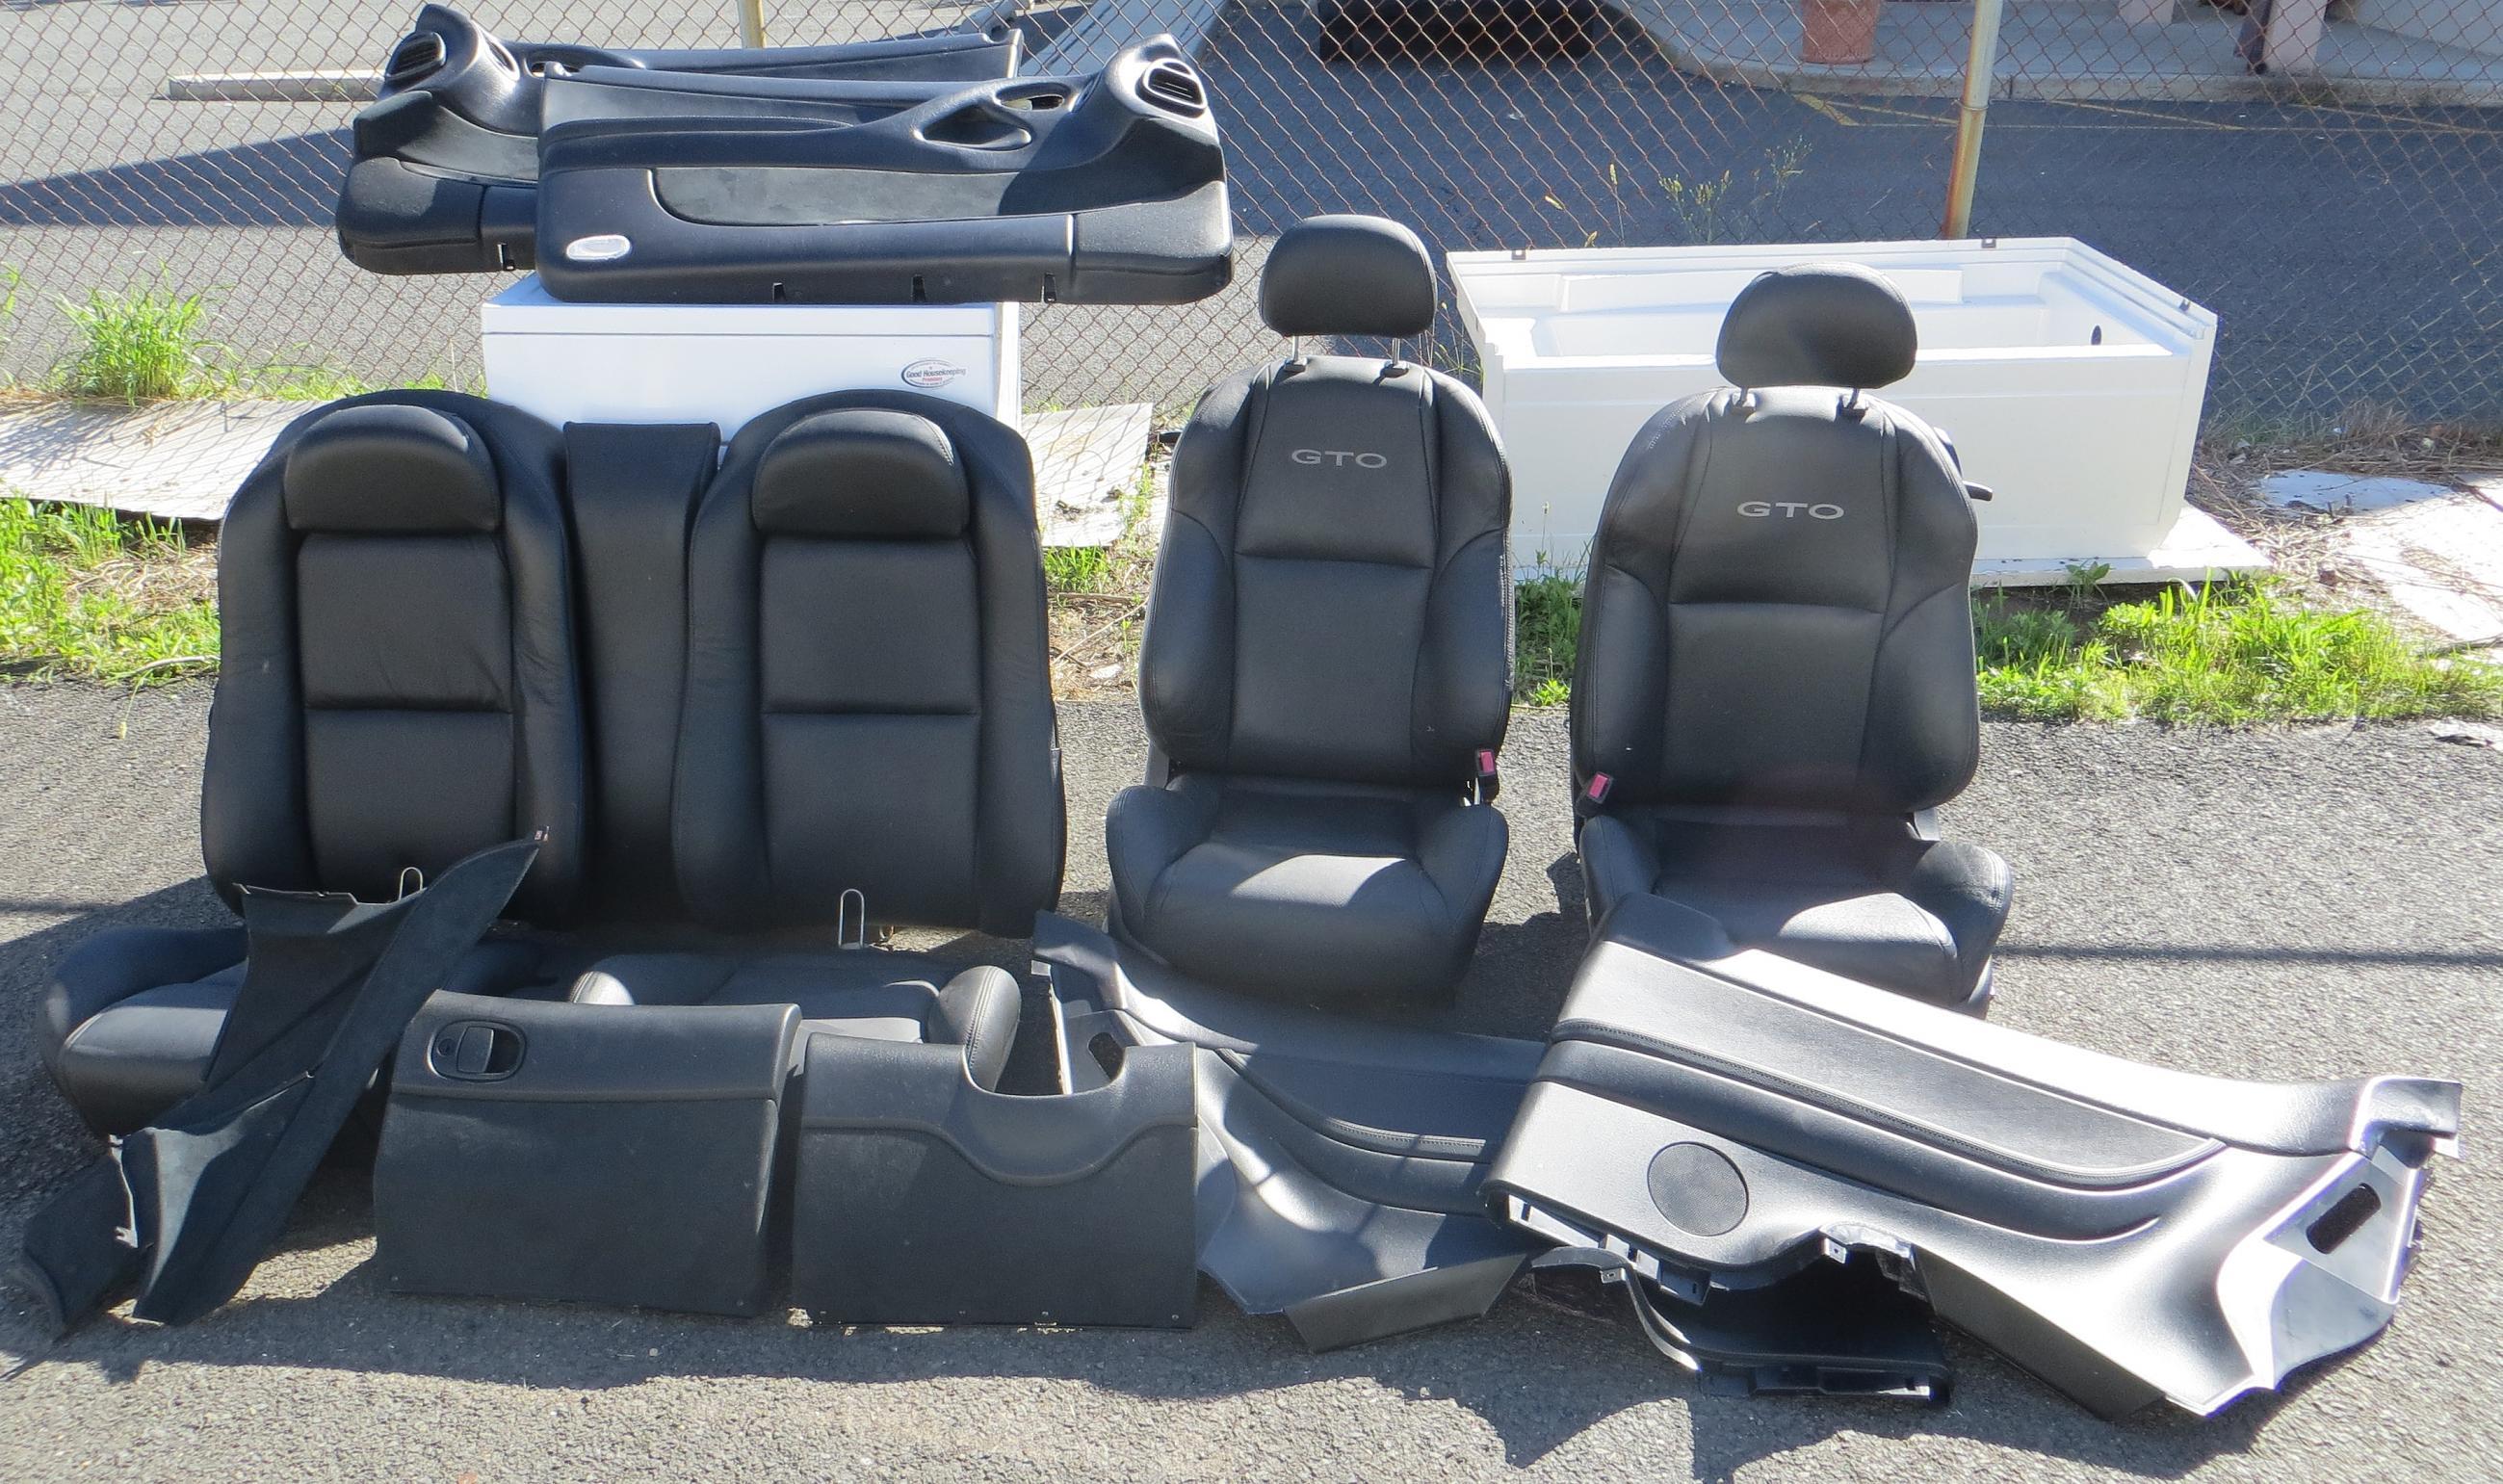 04 06 GTO Black Interior Seats Door Panels Trim Panels 12